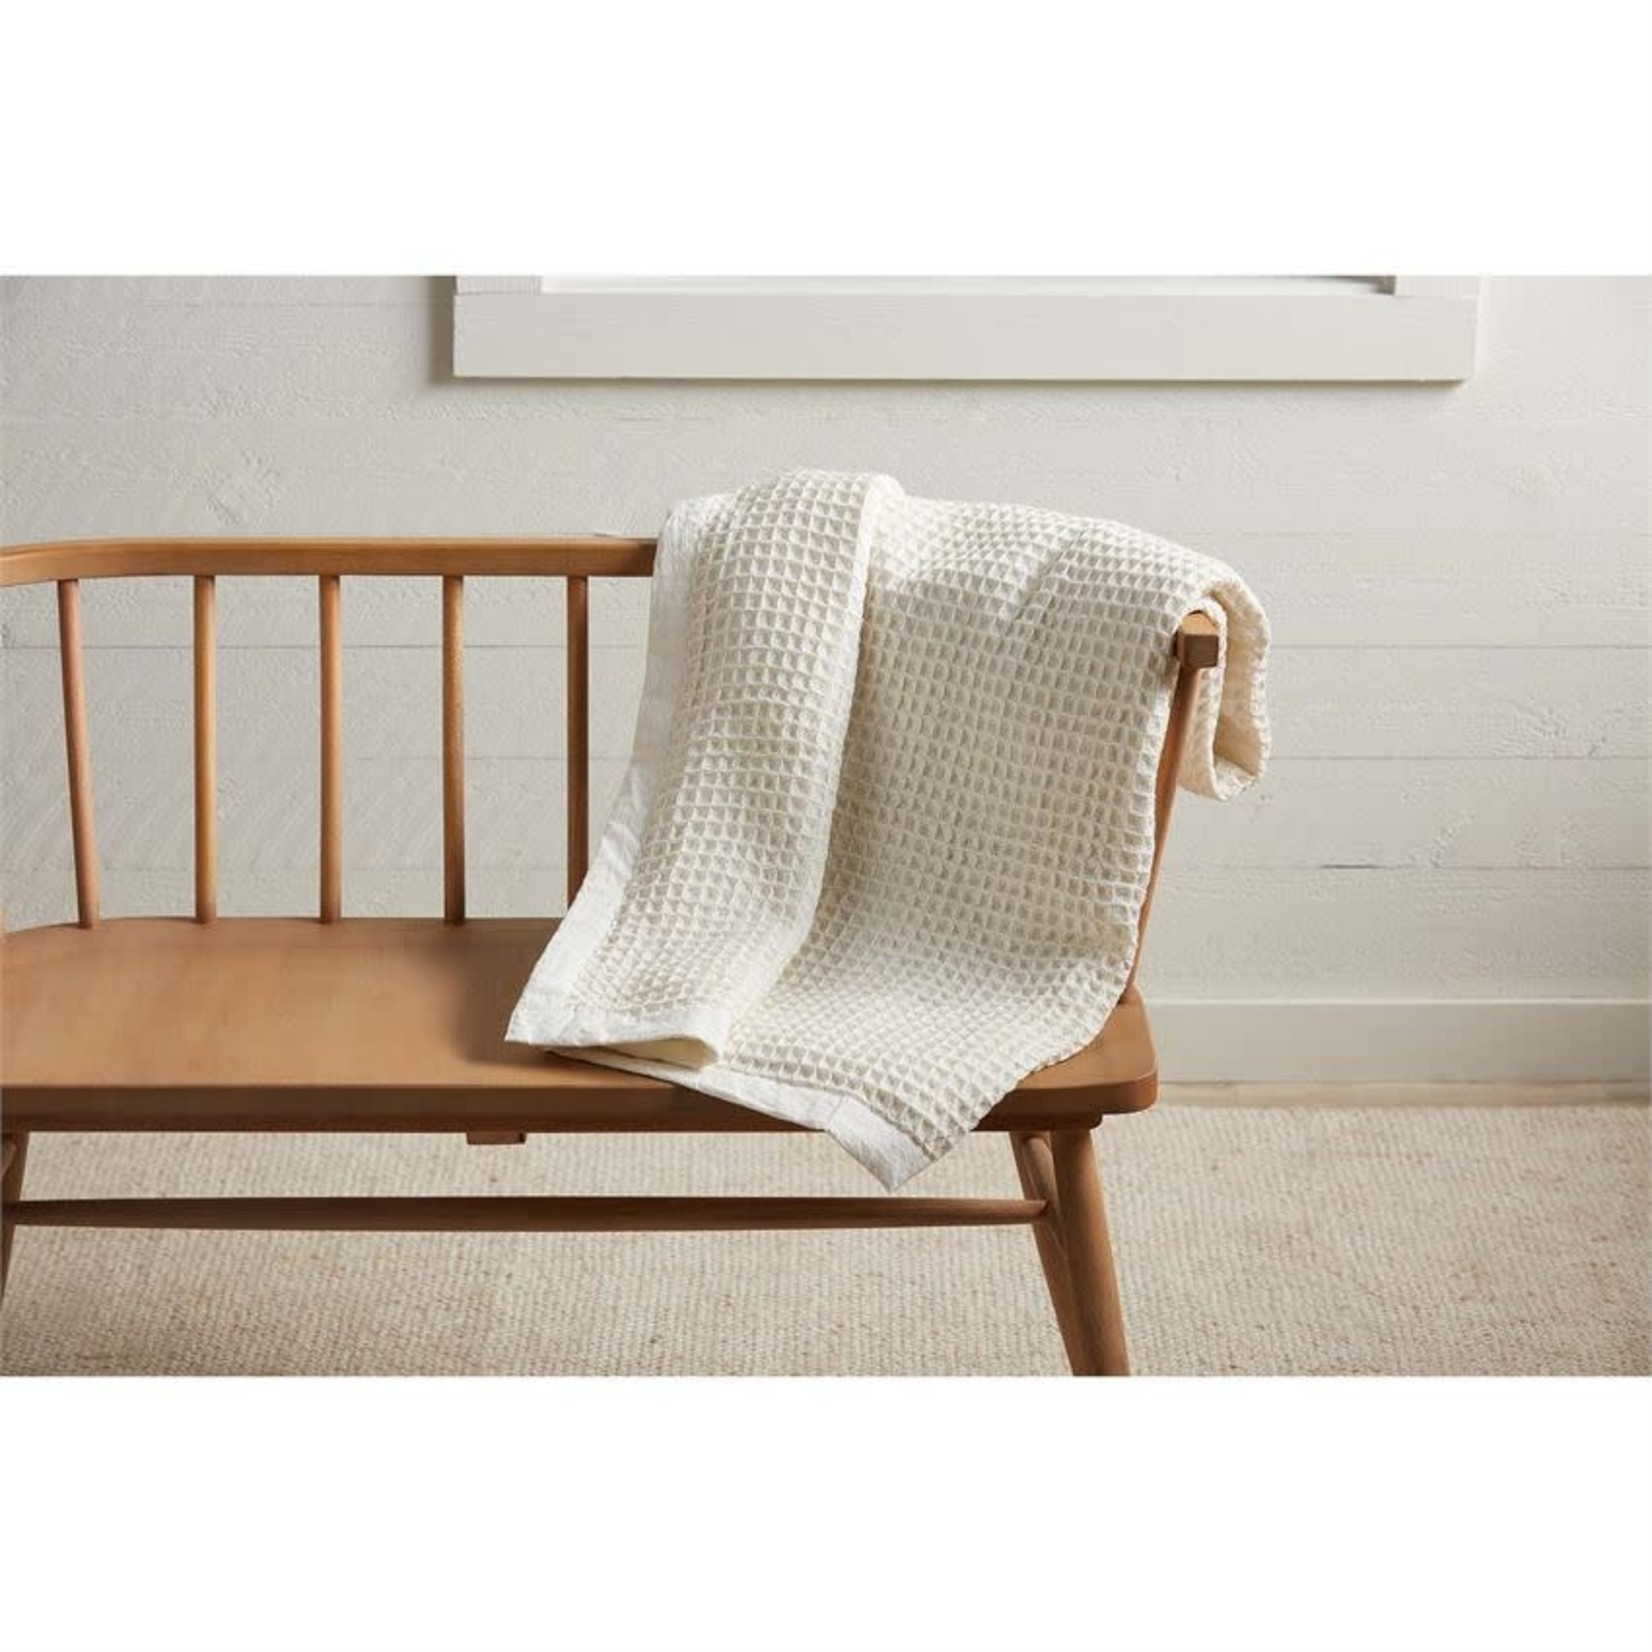 White Waffle Weave Blanket